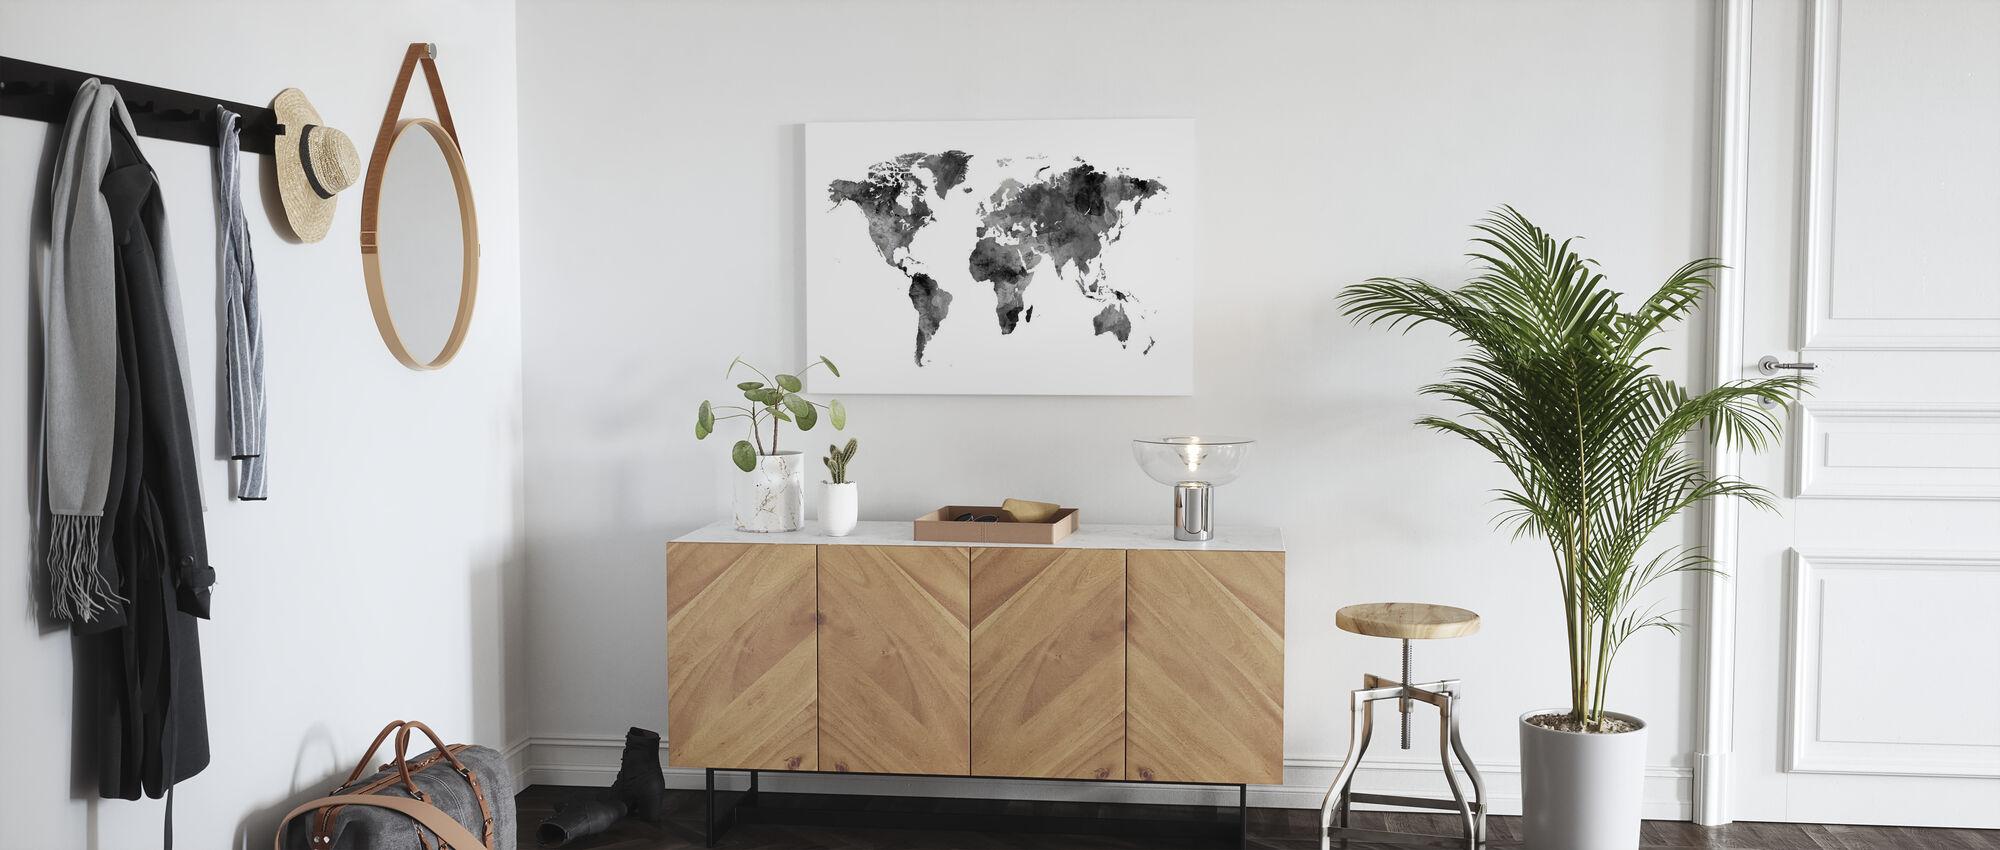 Akvarell World Karta Svart - Canvastavla - Hall